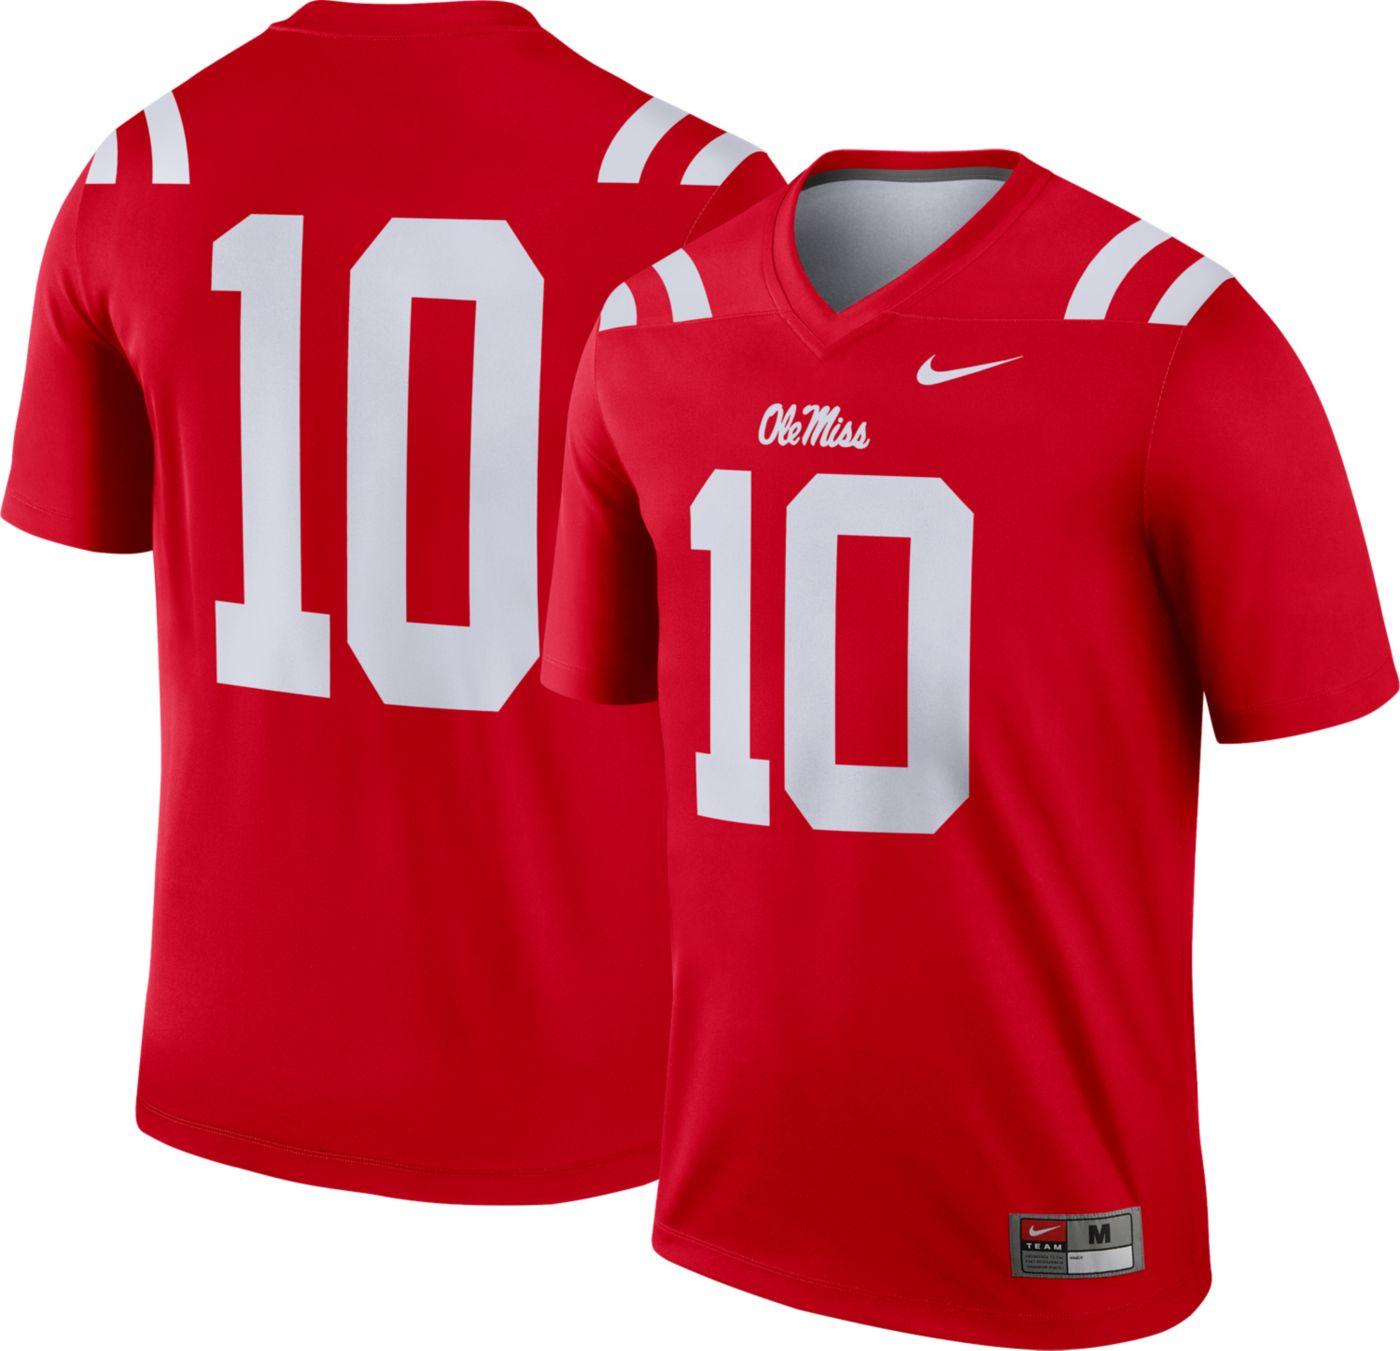 Nike Men's Ole Miss Rebels #10 Red Dri-FIT Legend Football Jersey